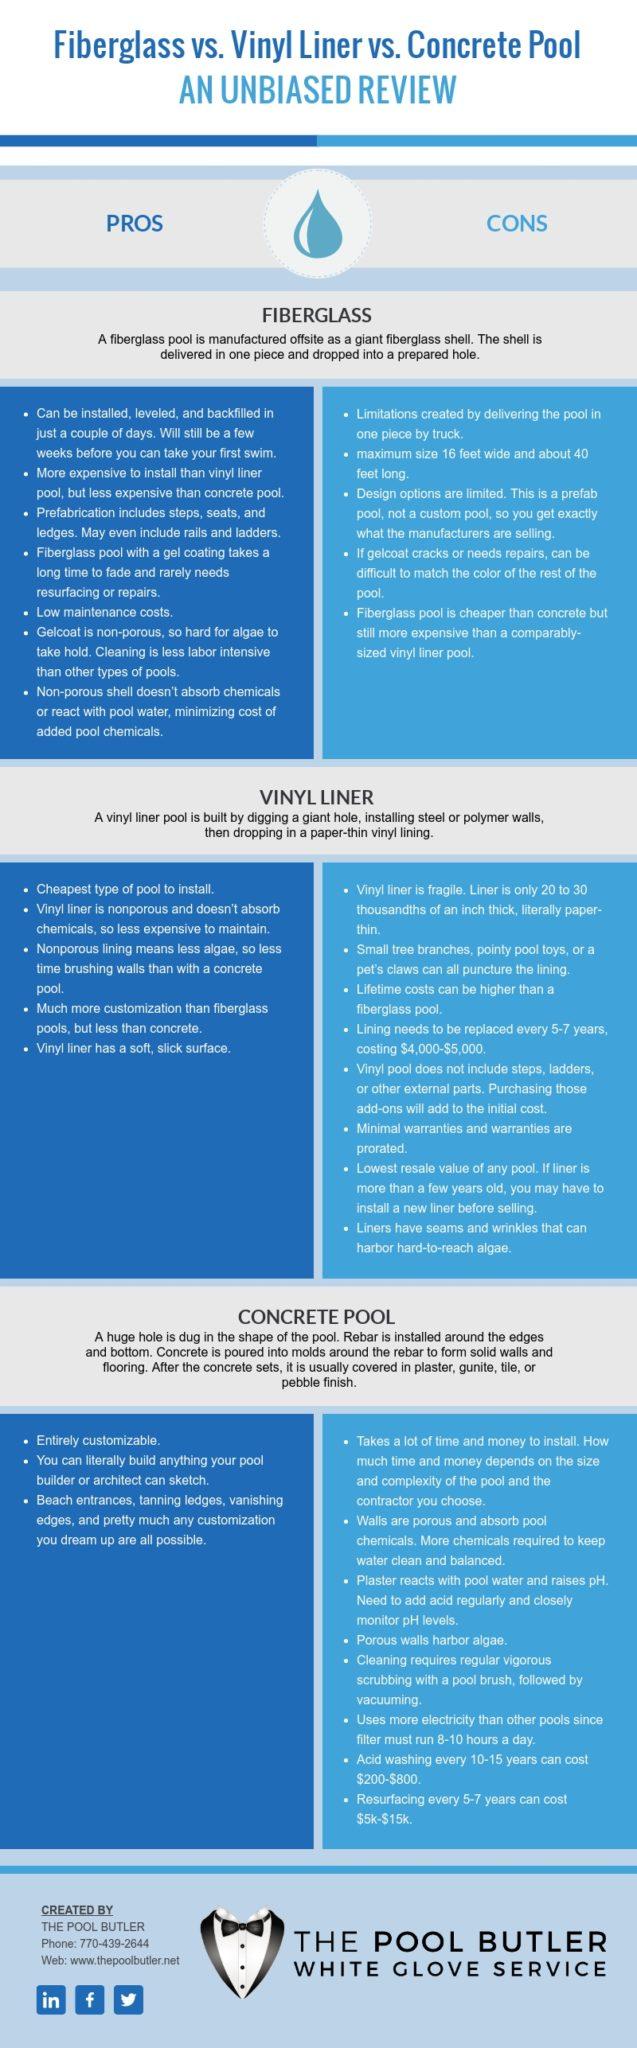 Fiberglass vs Vinyl Liner vs Concrete Pool - An Unbiased Review [infographic]